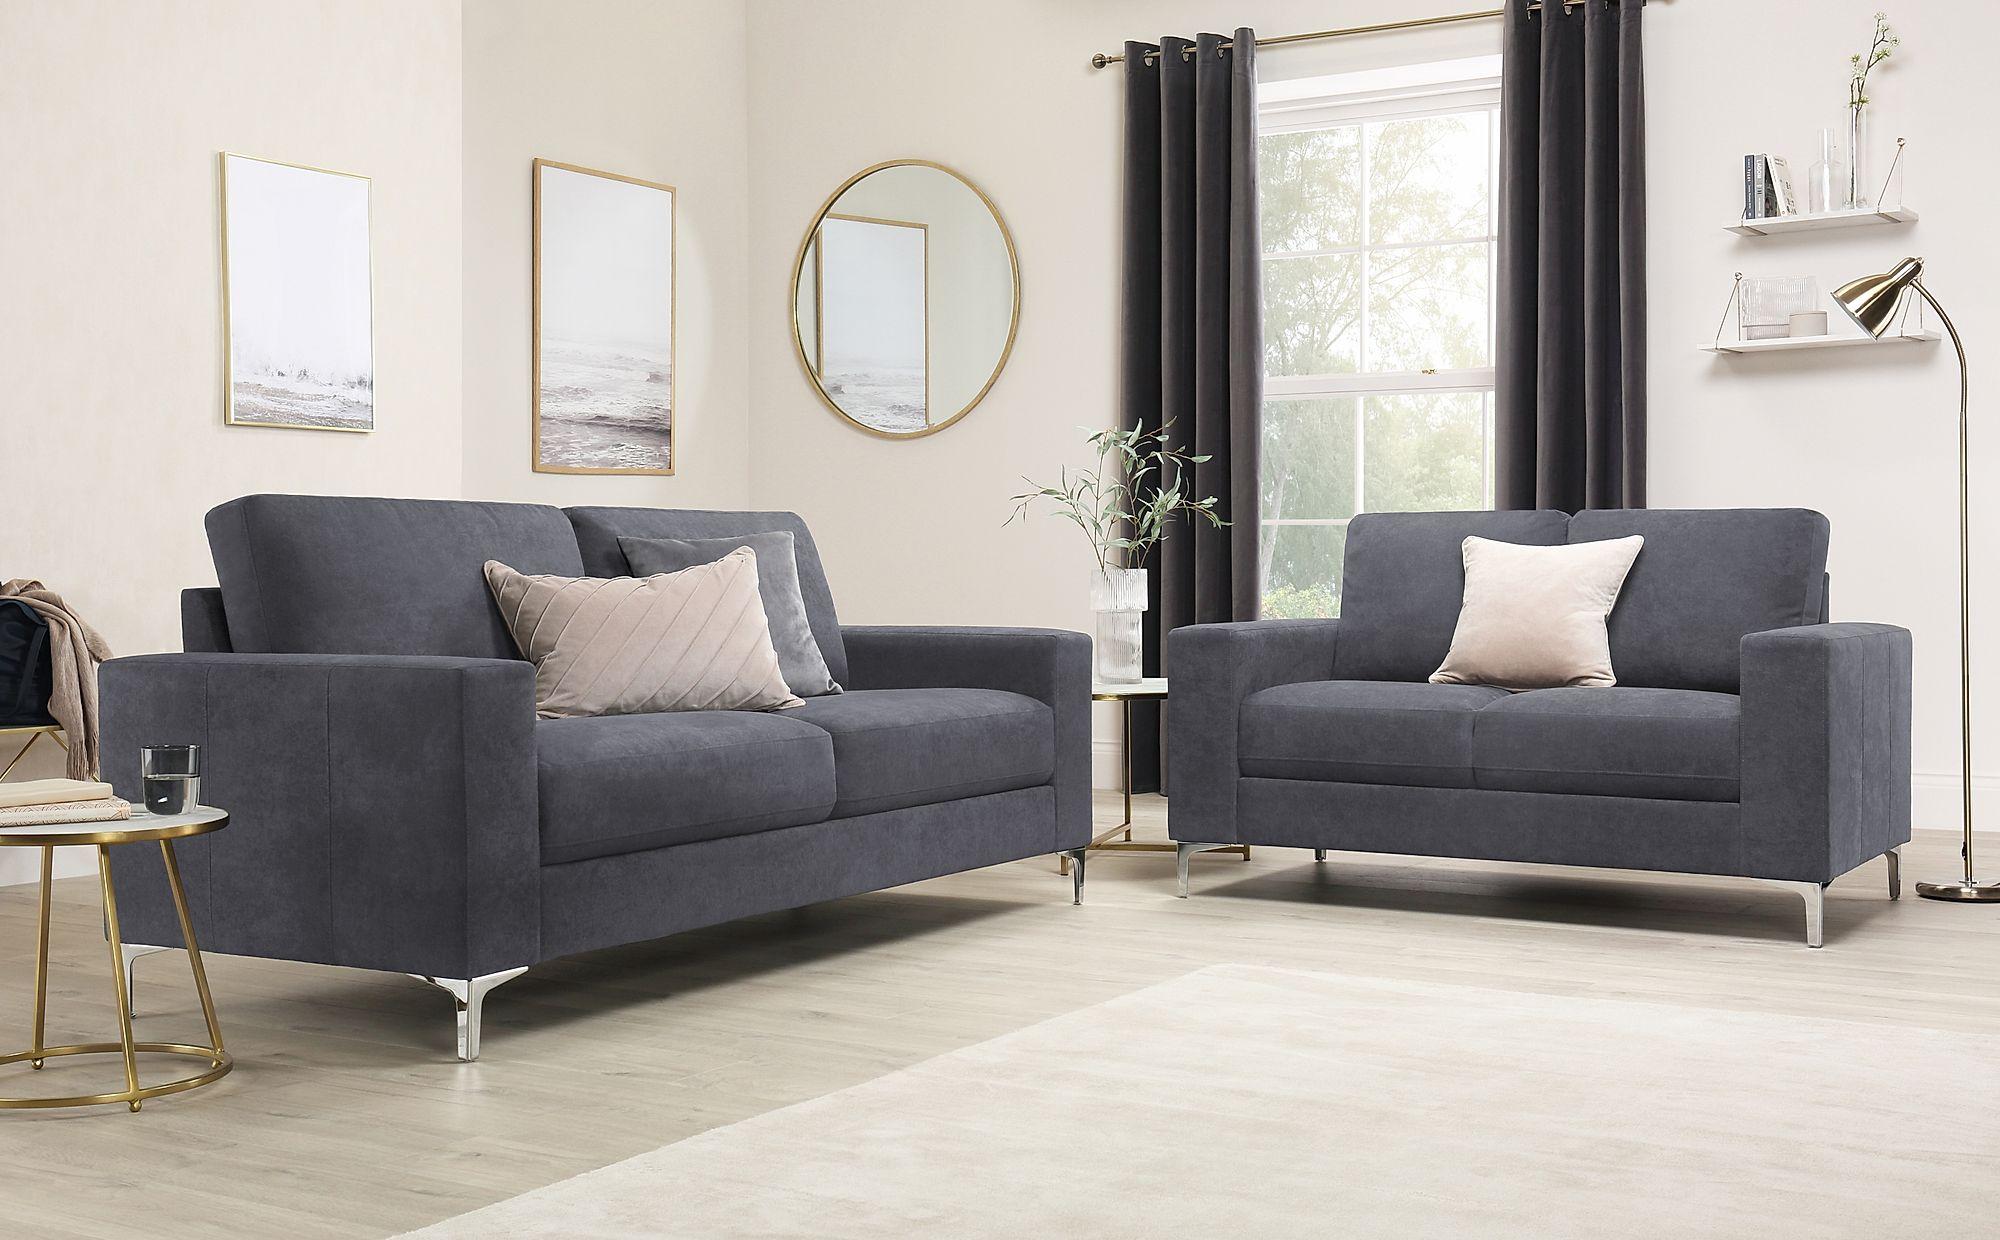 a3f06e81f7 Baltimore Slate Grey Plush Fabric Sofa 3+2 Seater Only £699.98 ...